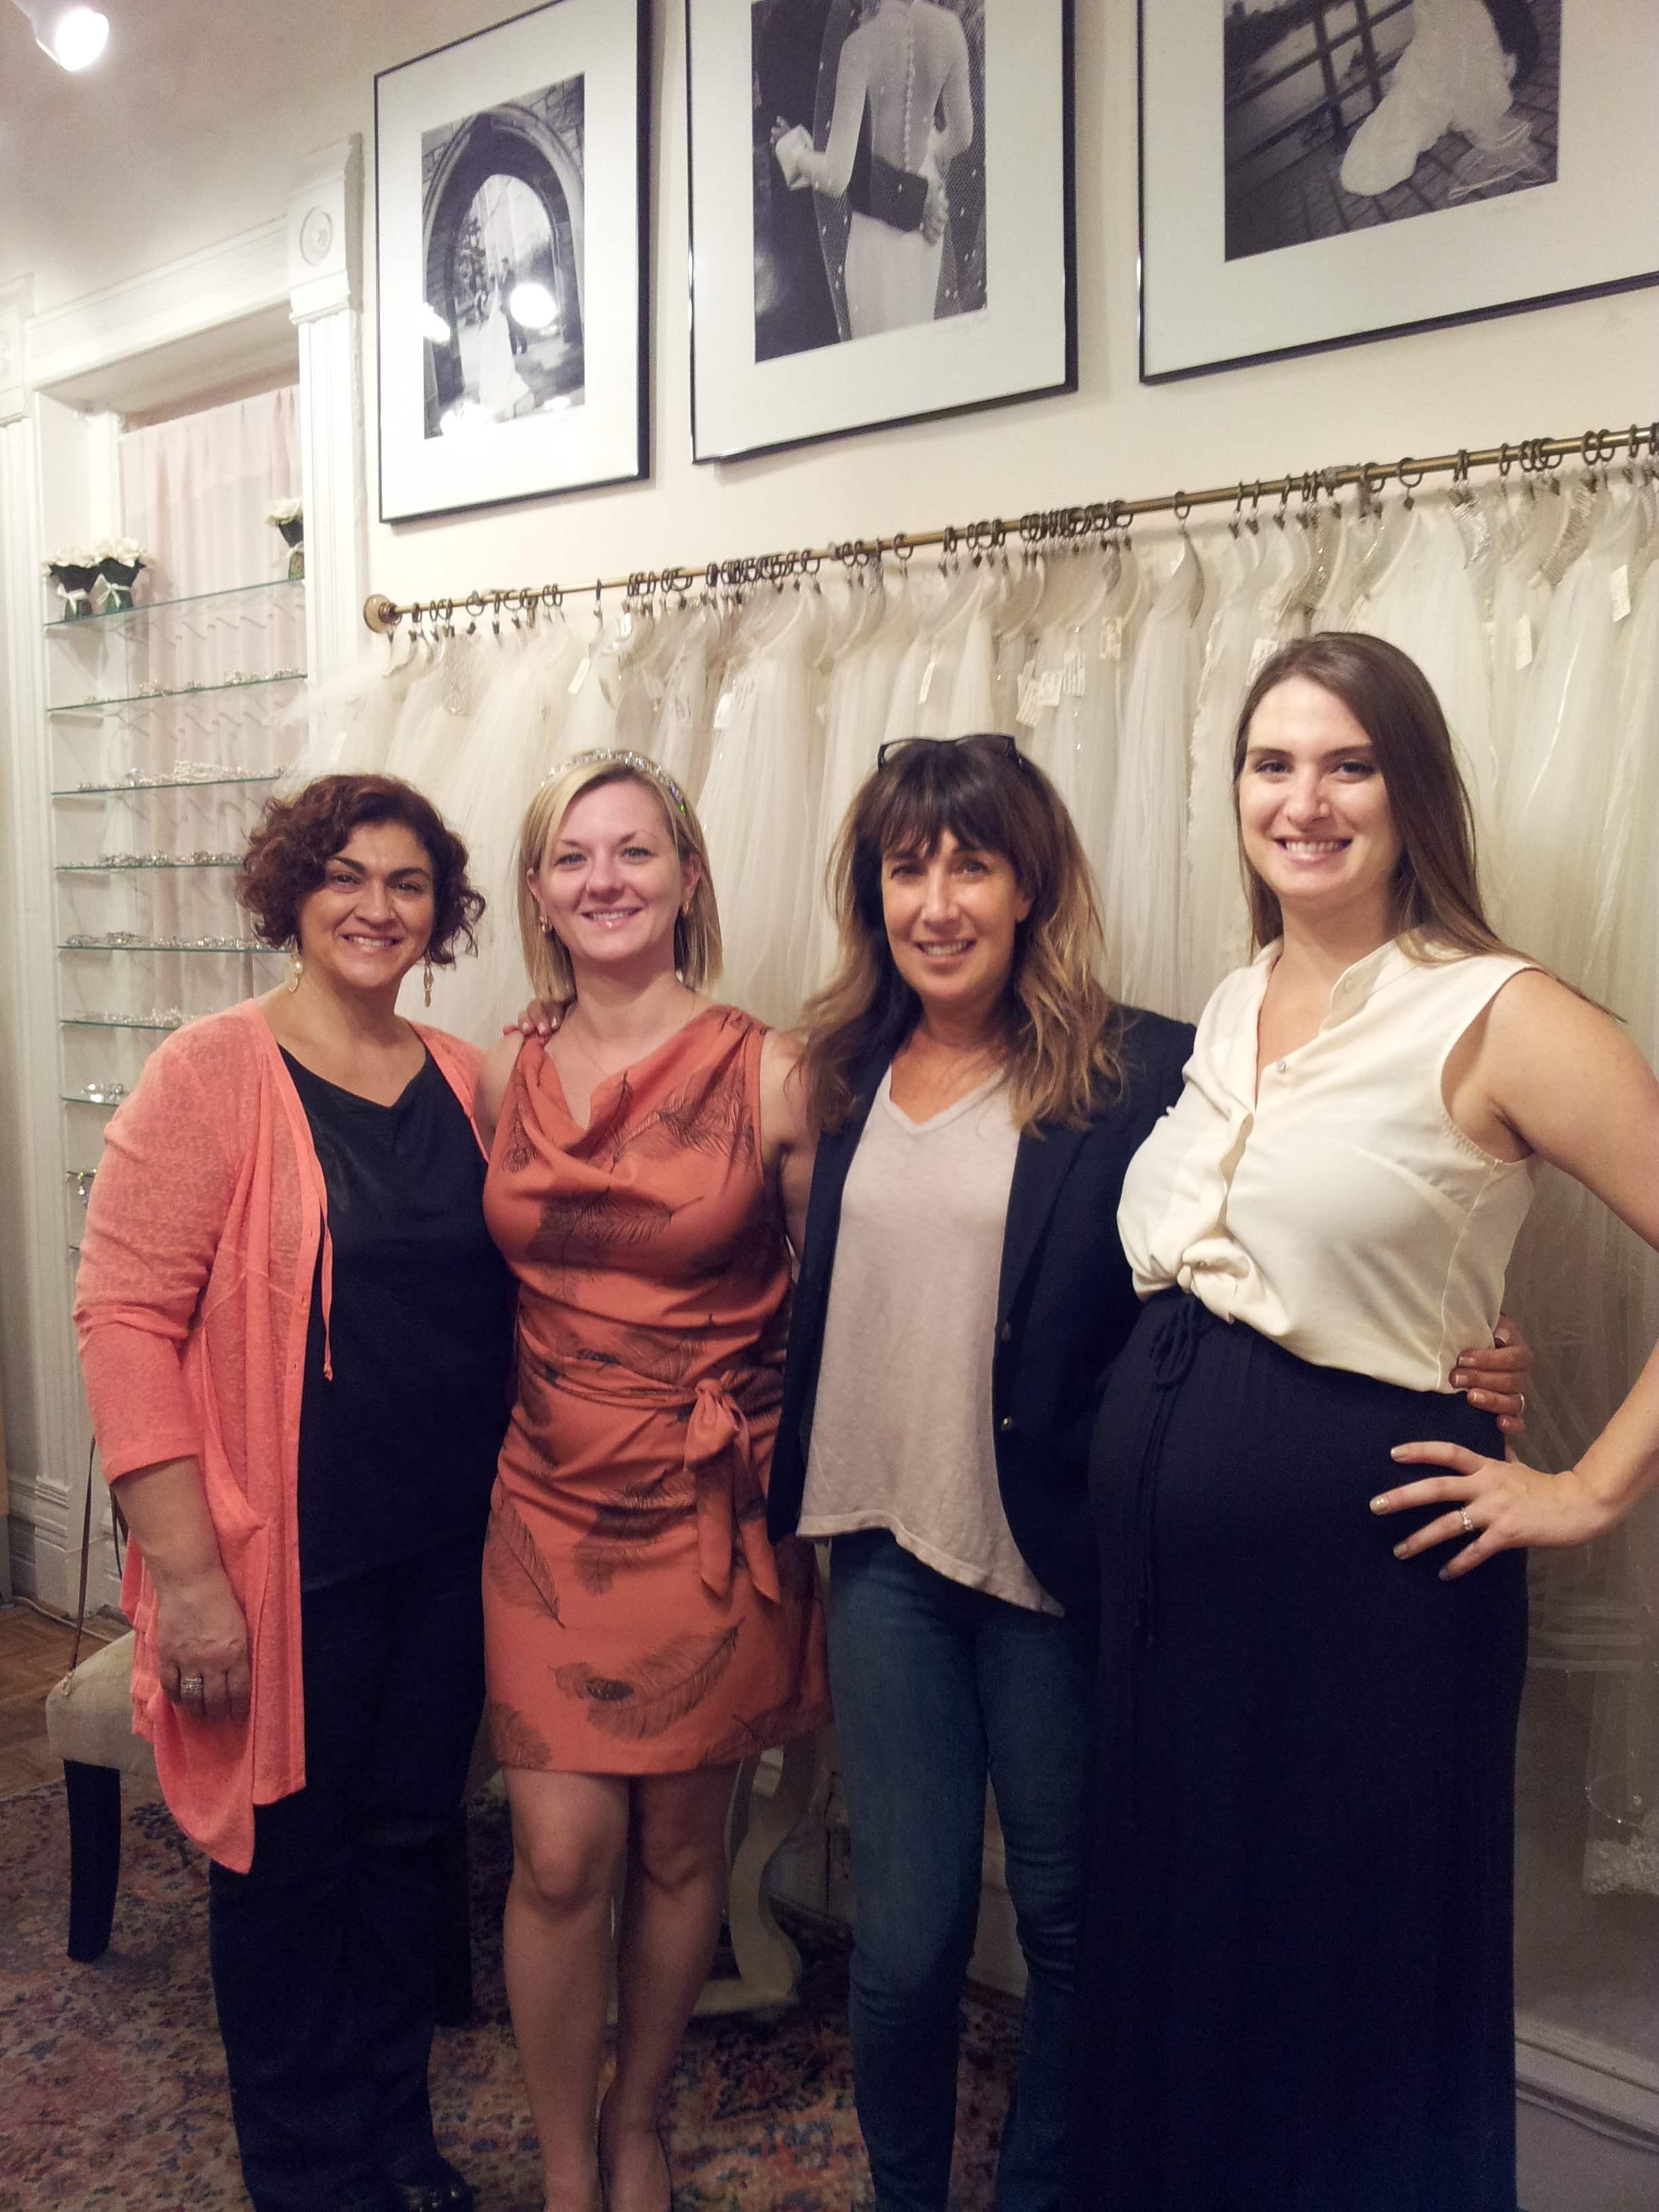 Angie, Suzie, Elen, and Caitlin